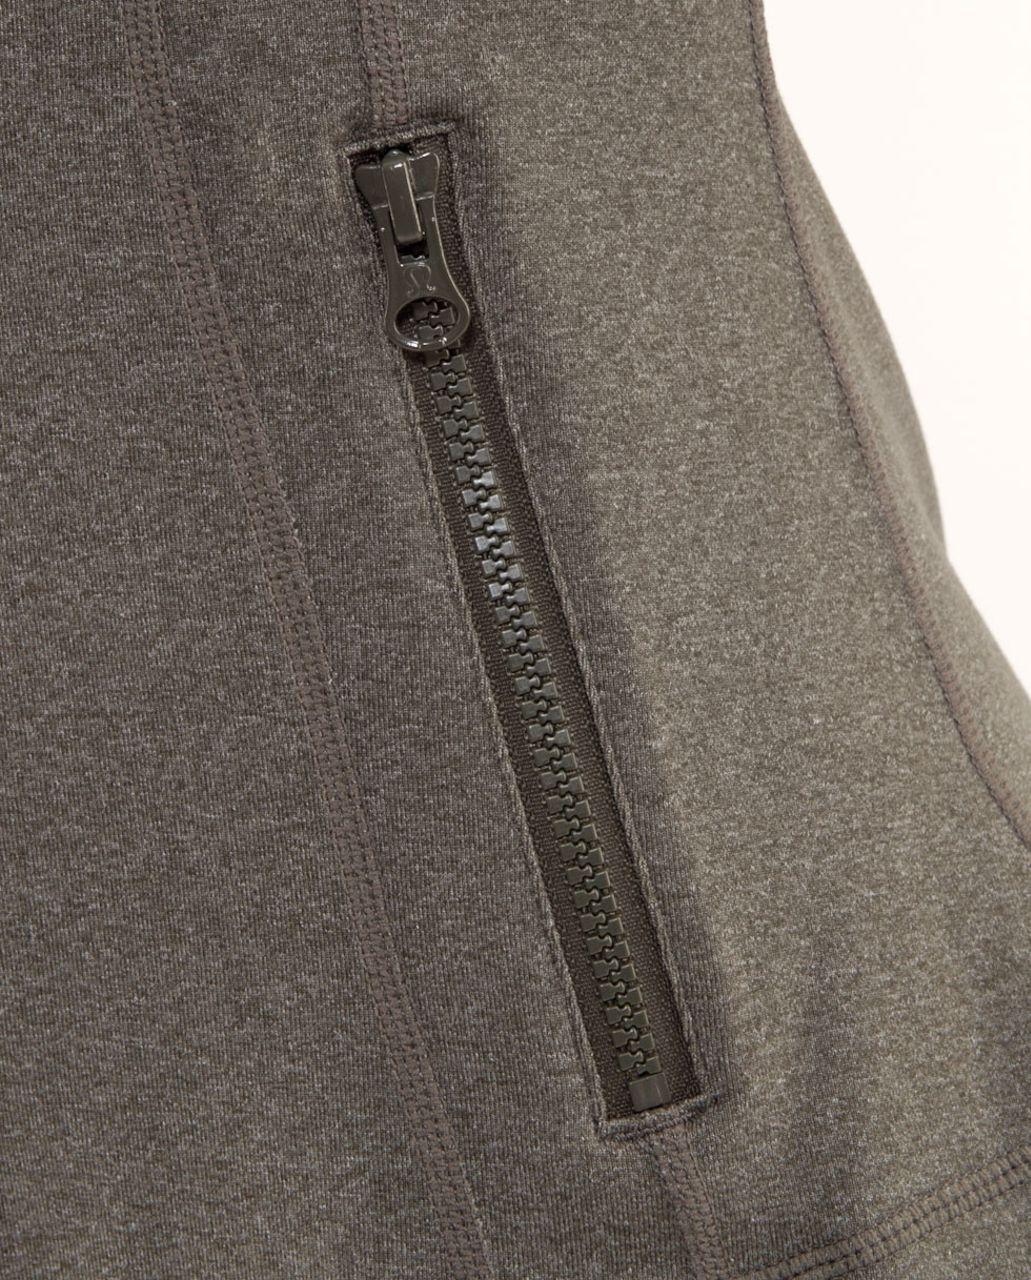 Lululemon Define Jacket - Heathered Wren /  Wren